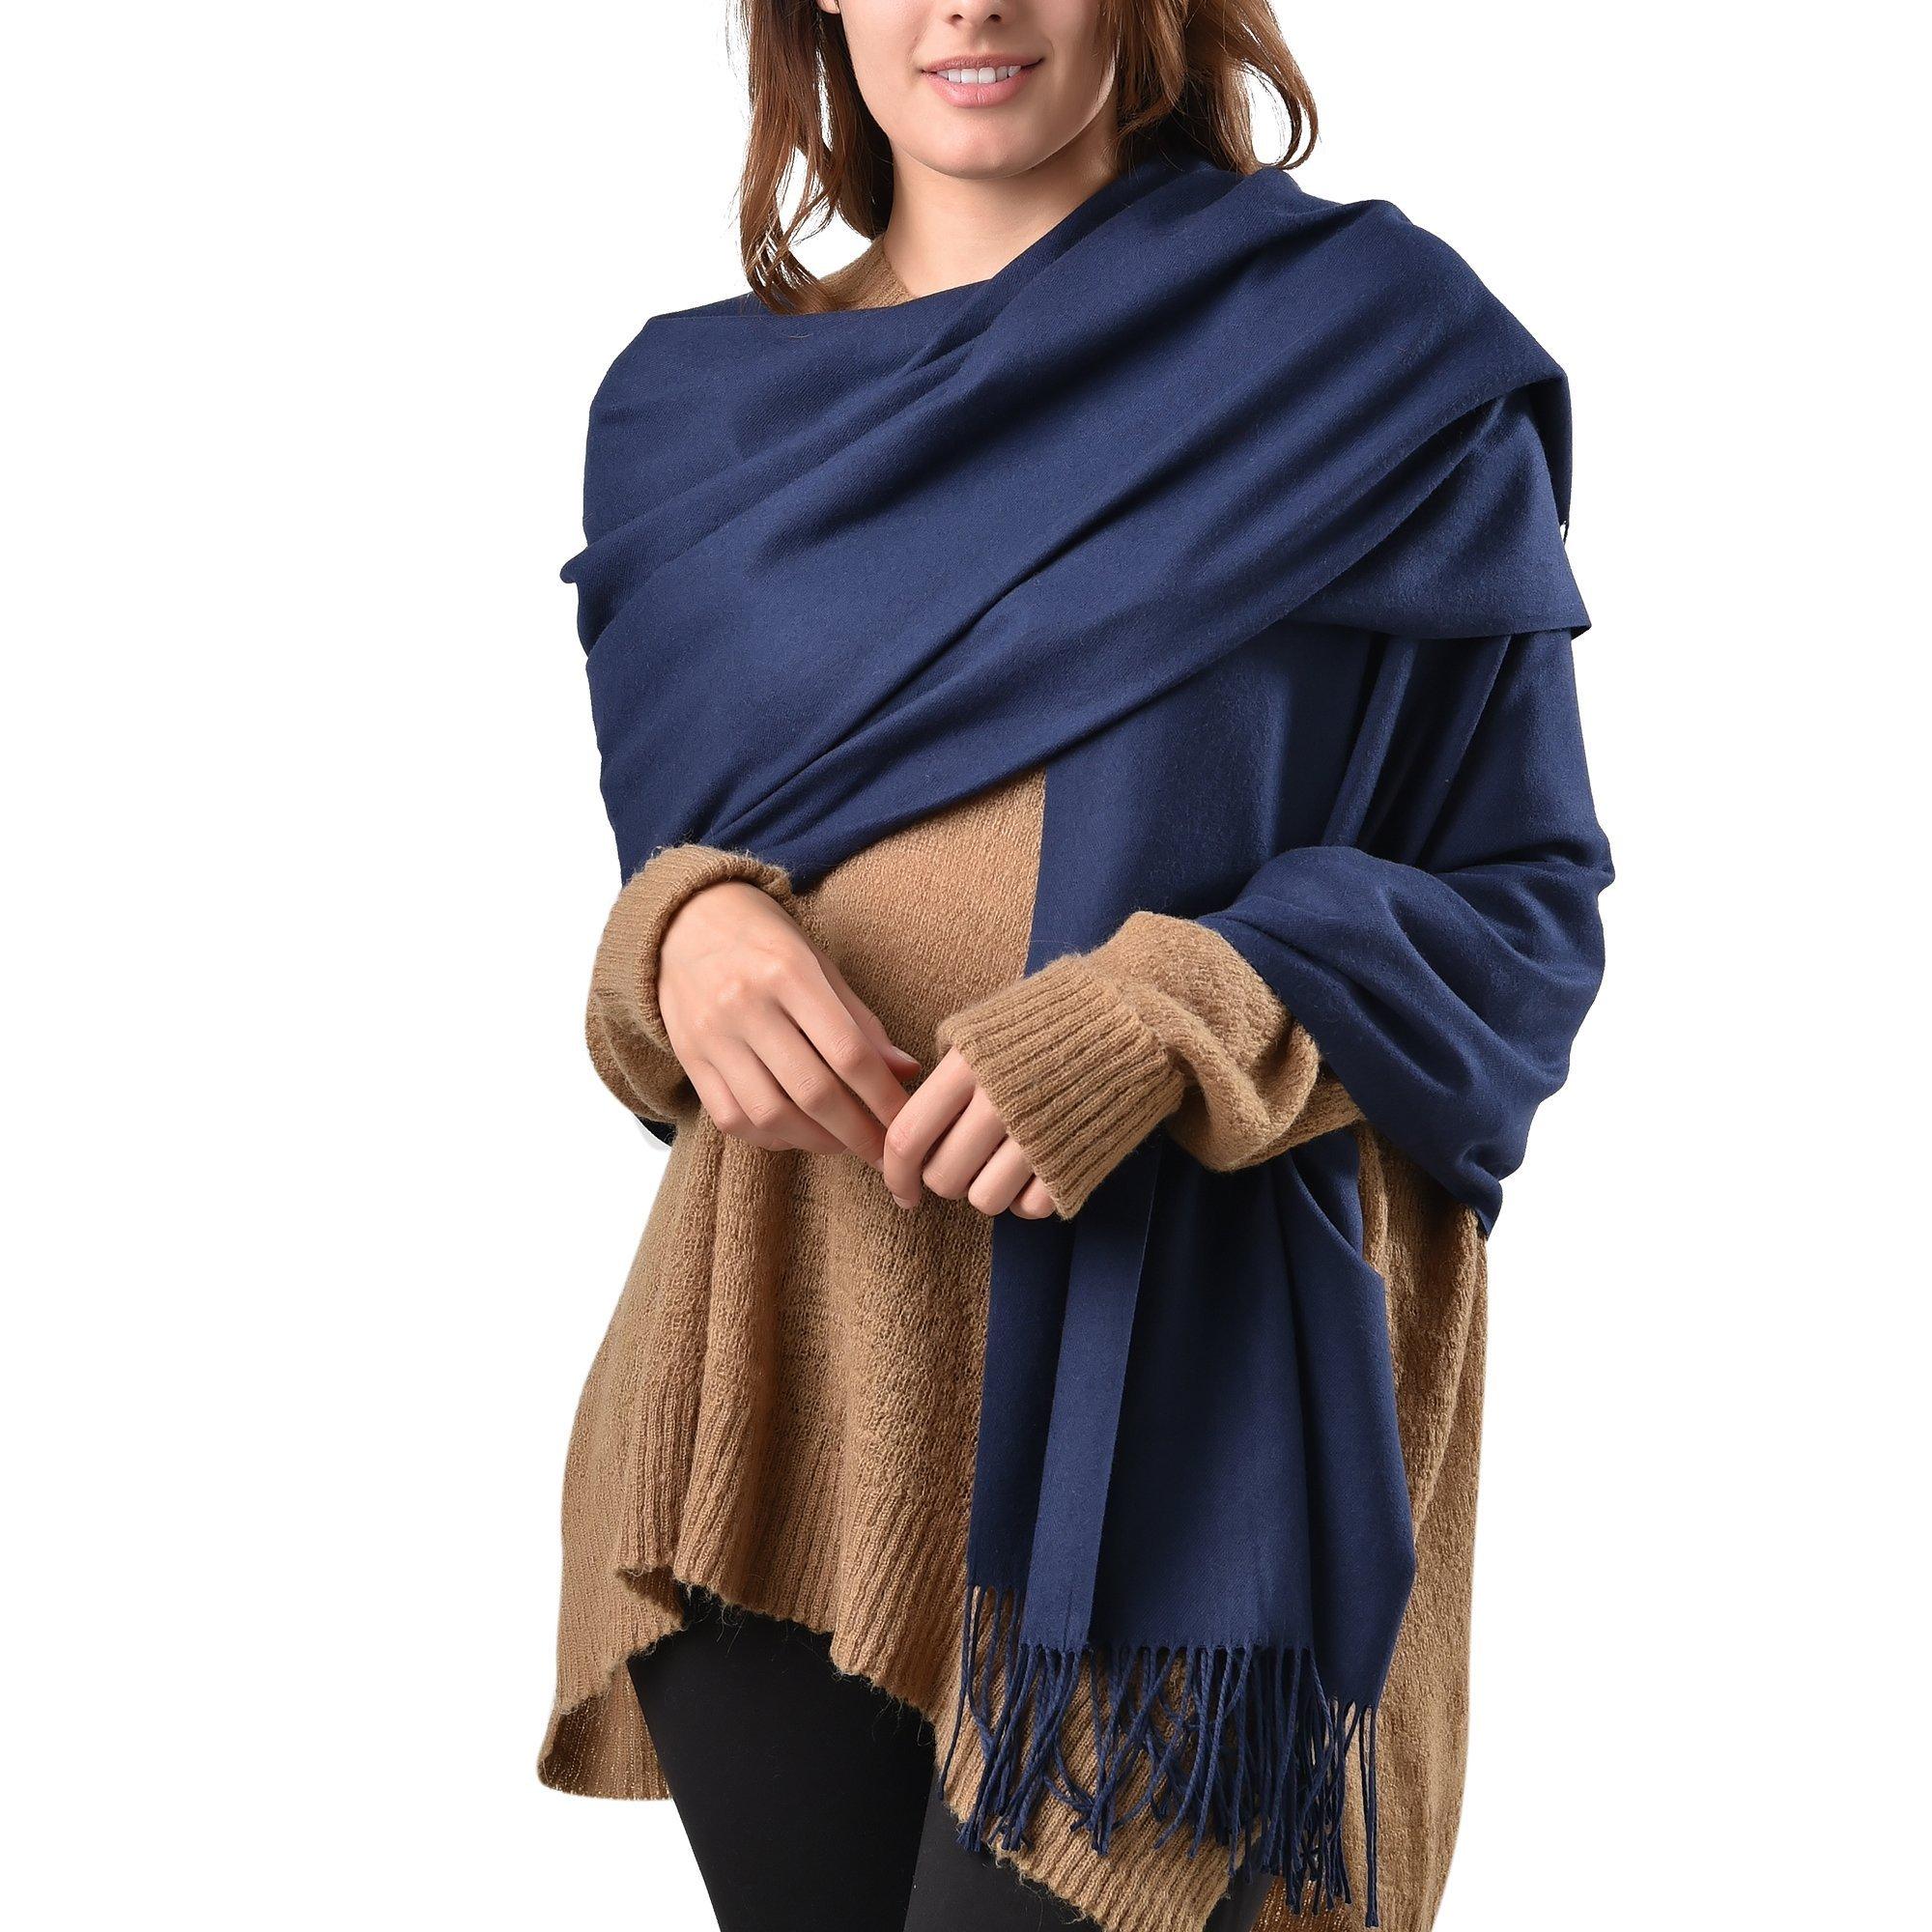 Womens Large Soft Pashmina Shawl Wraps Scarf Stole for Wedding Evening Party